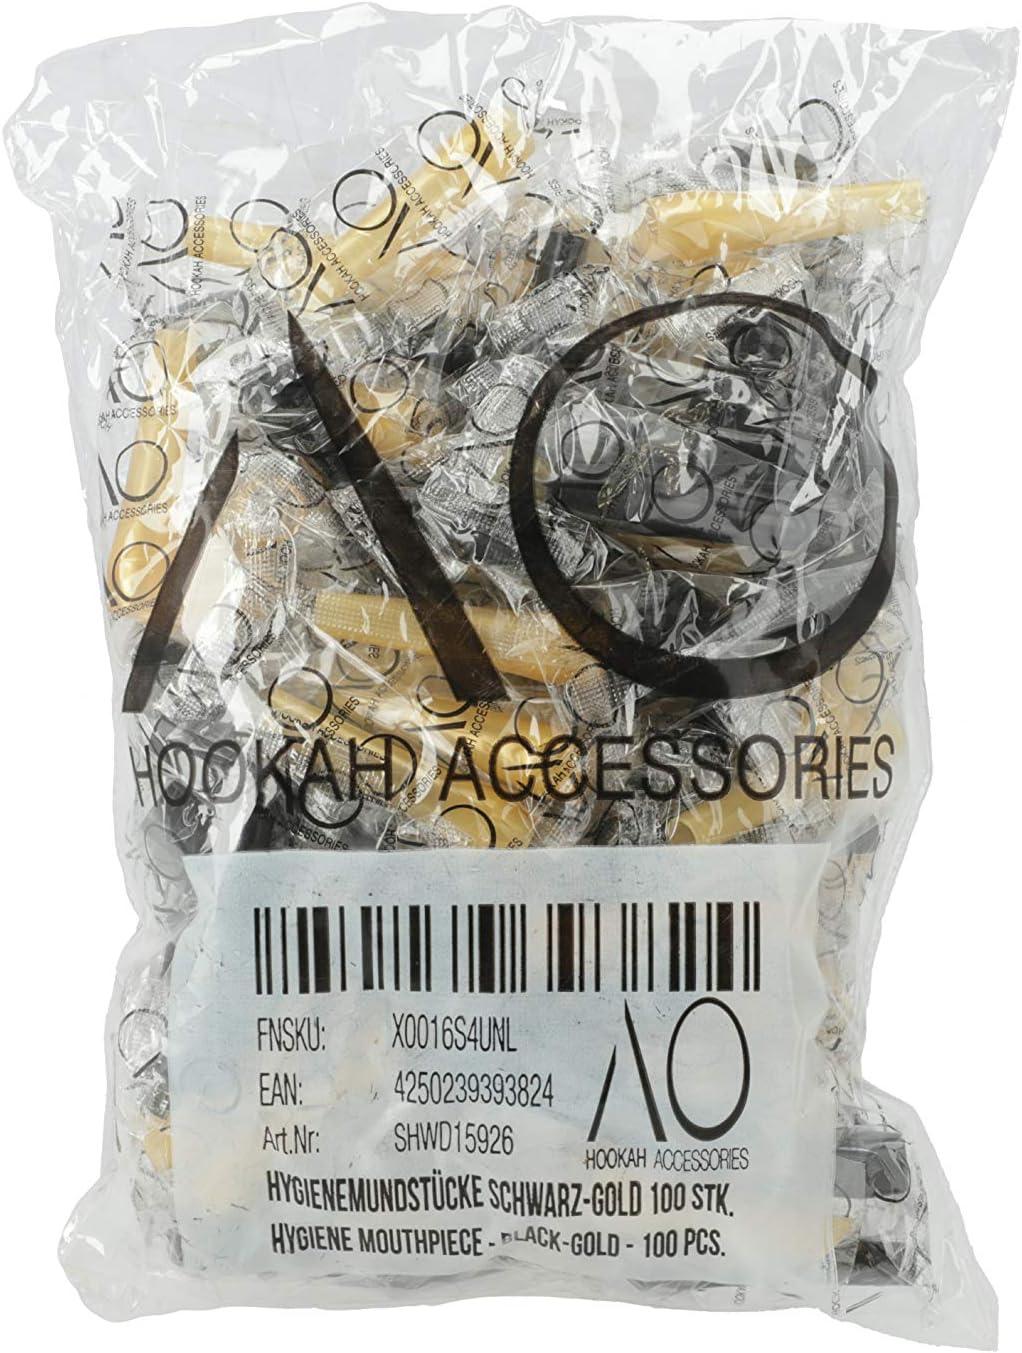 AO - Boquillas higiénicas para cachimba (100 unidades), color negro y dorado